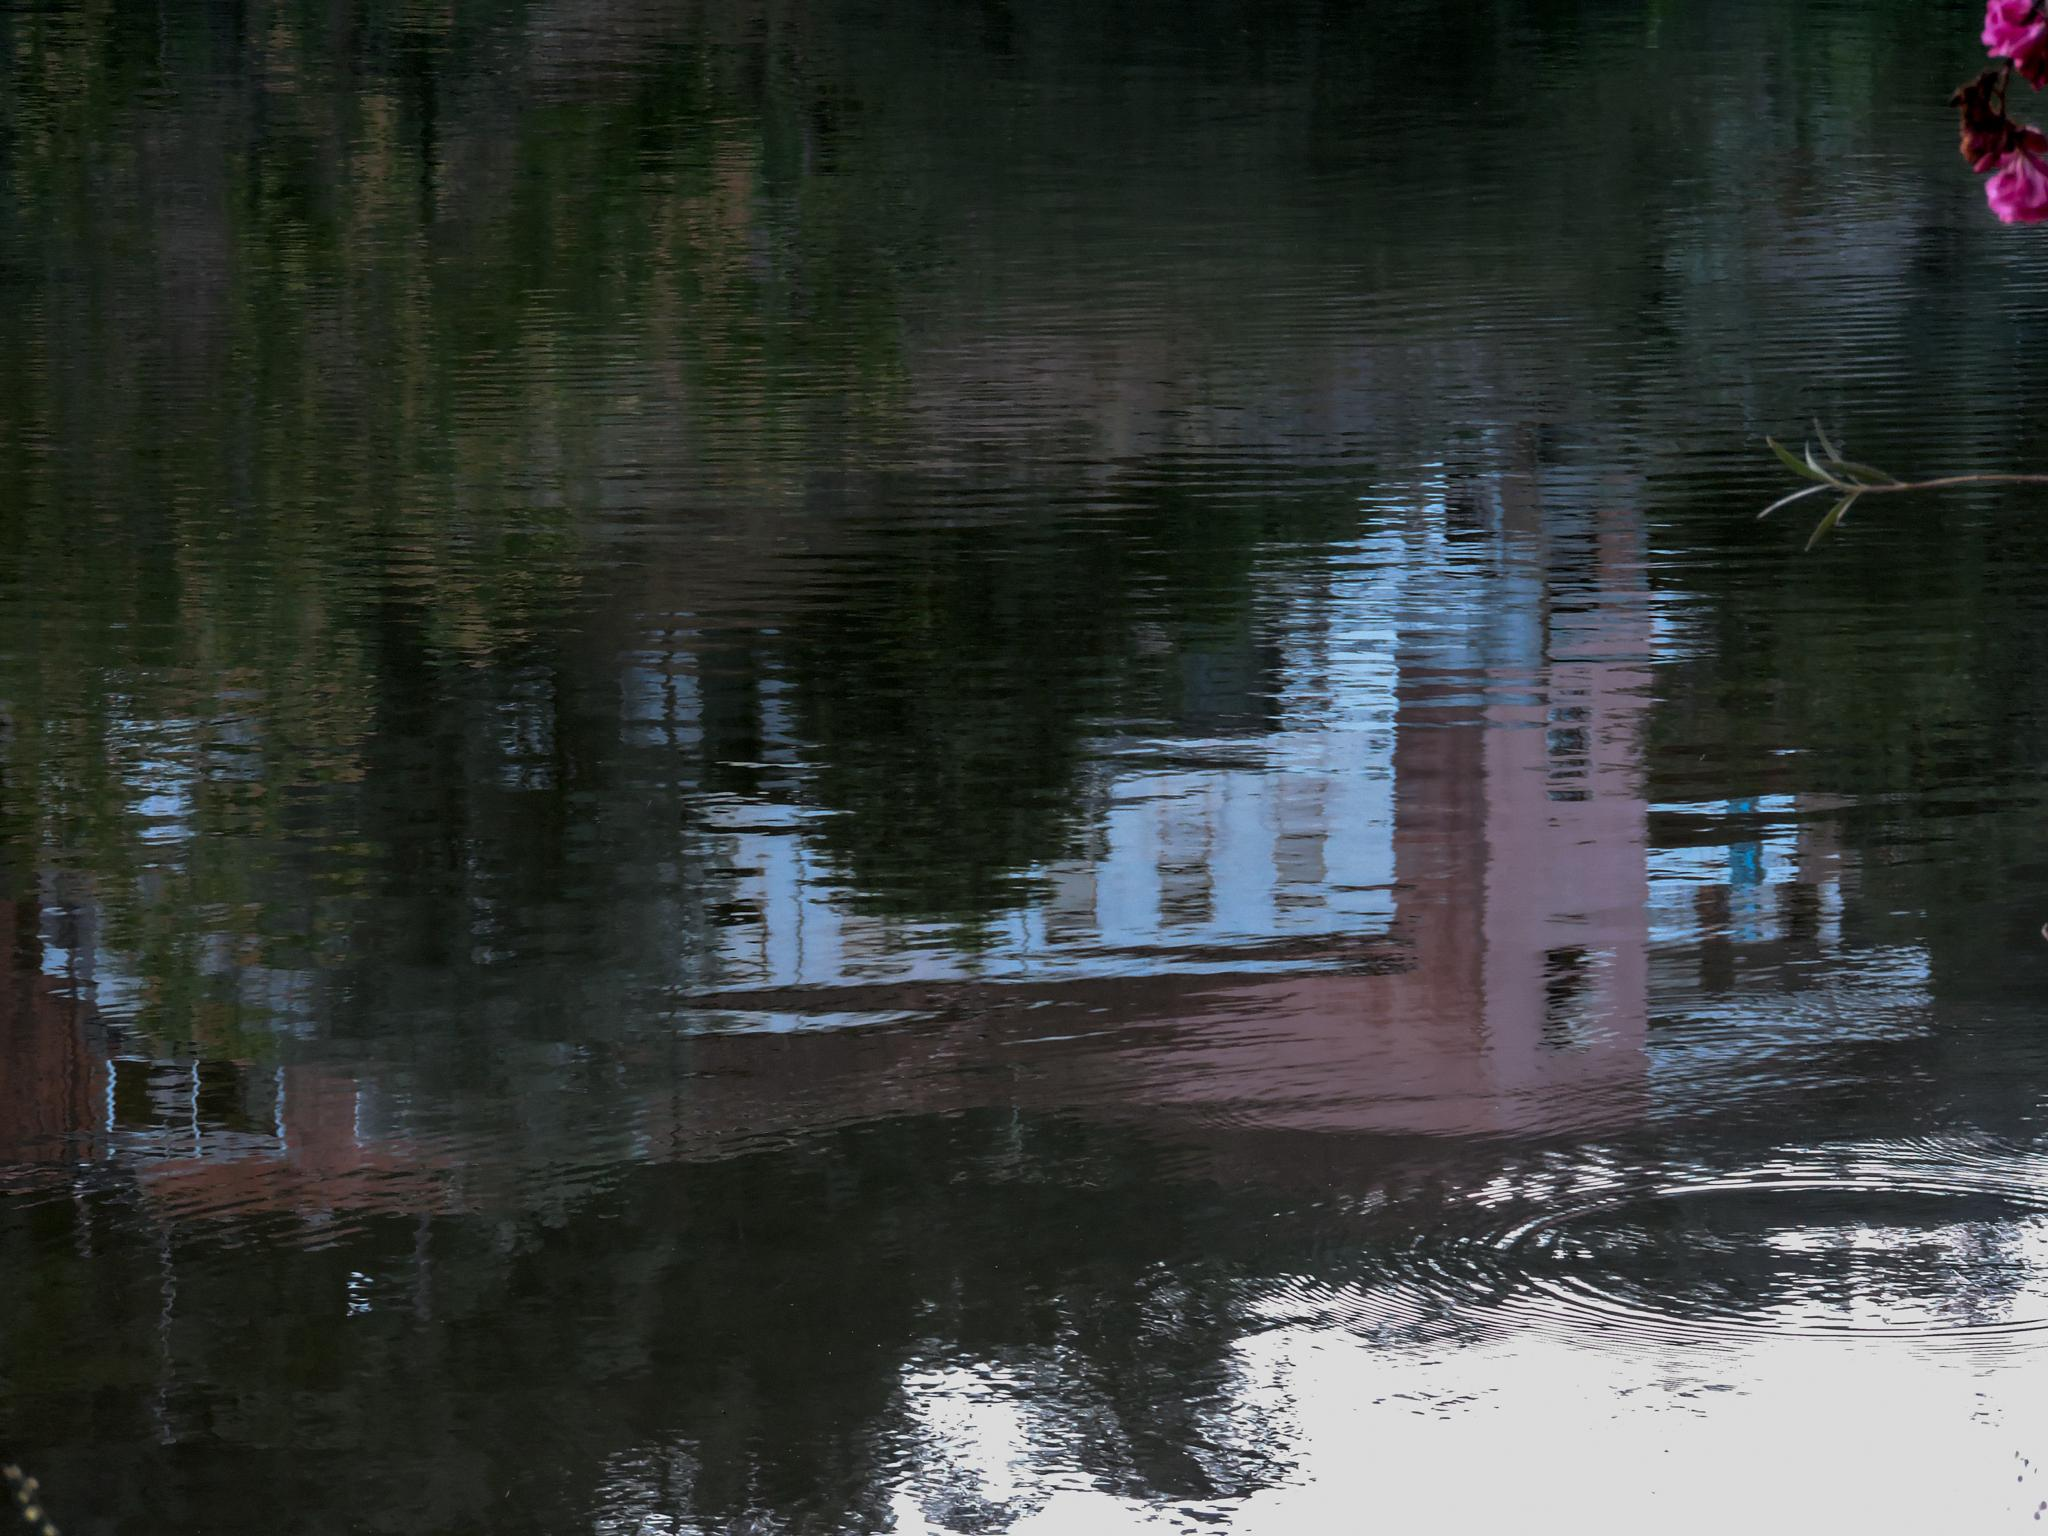 plunge house by Ana Botelho